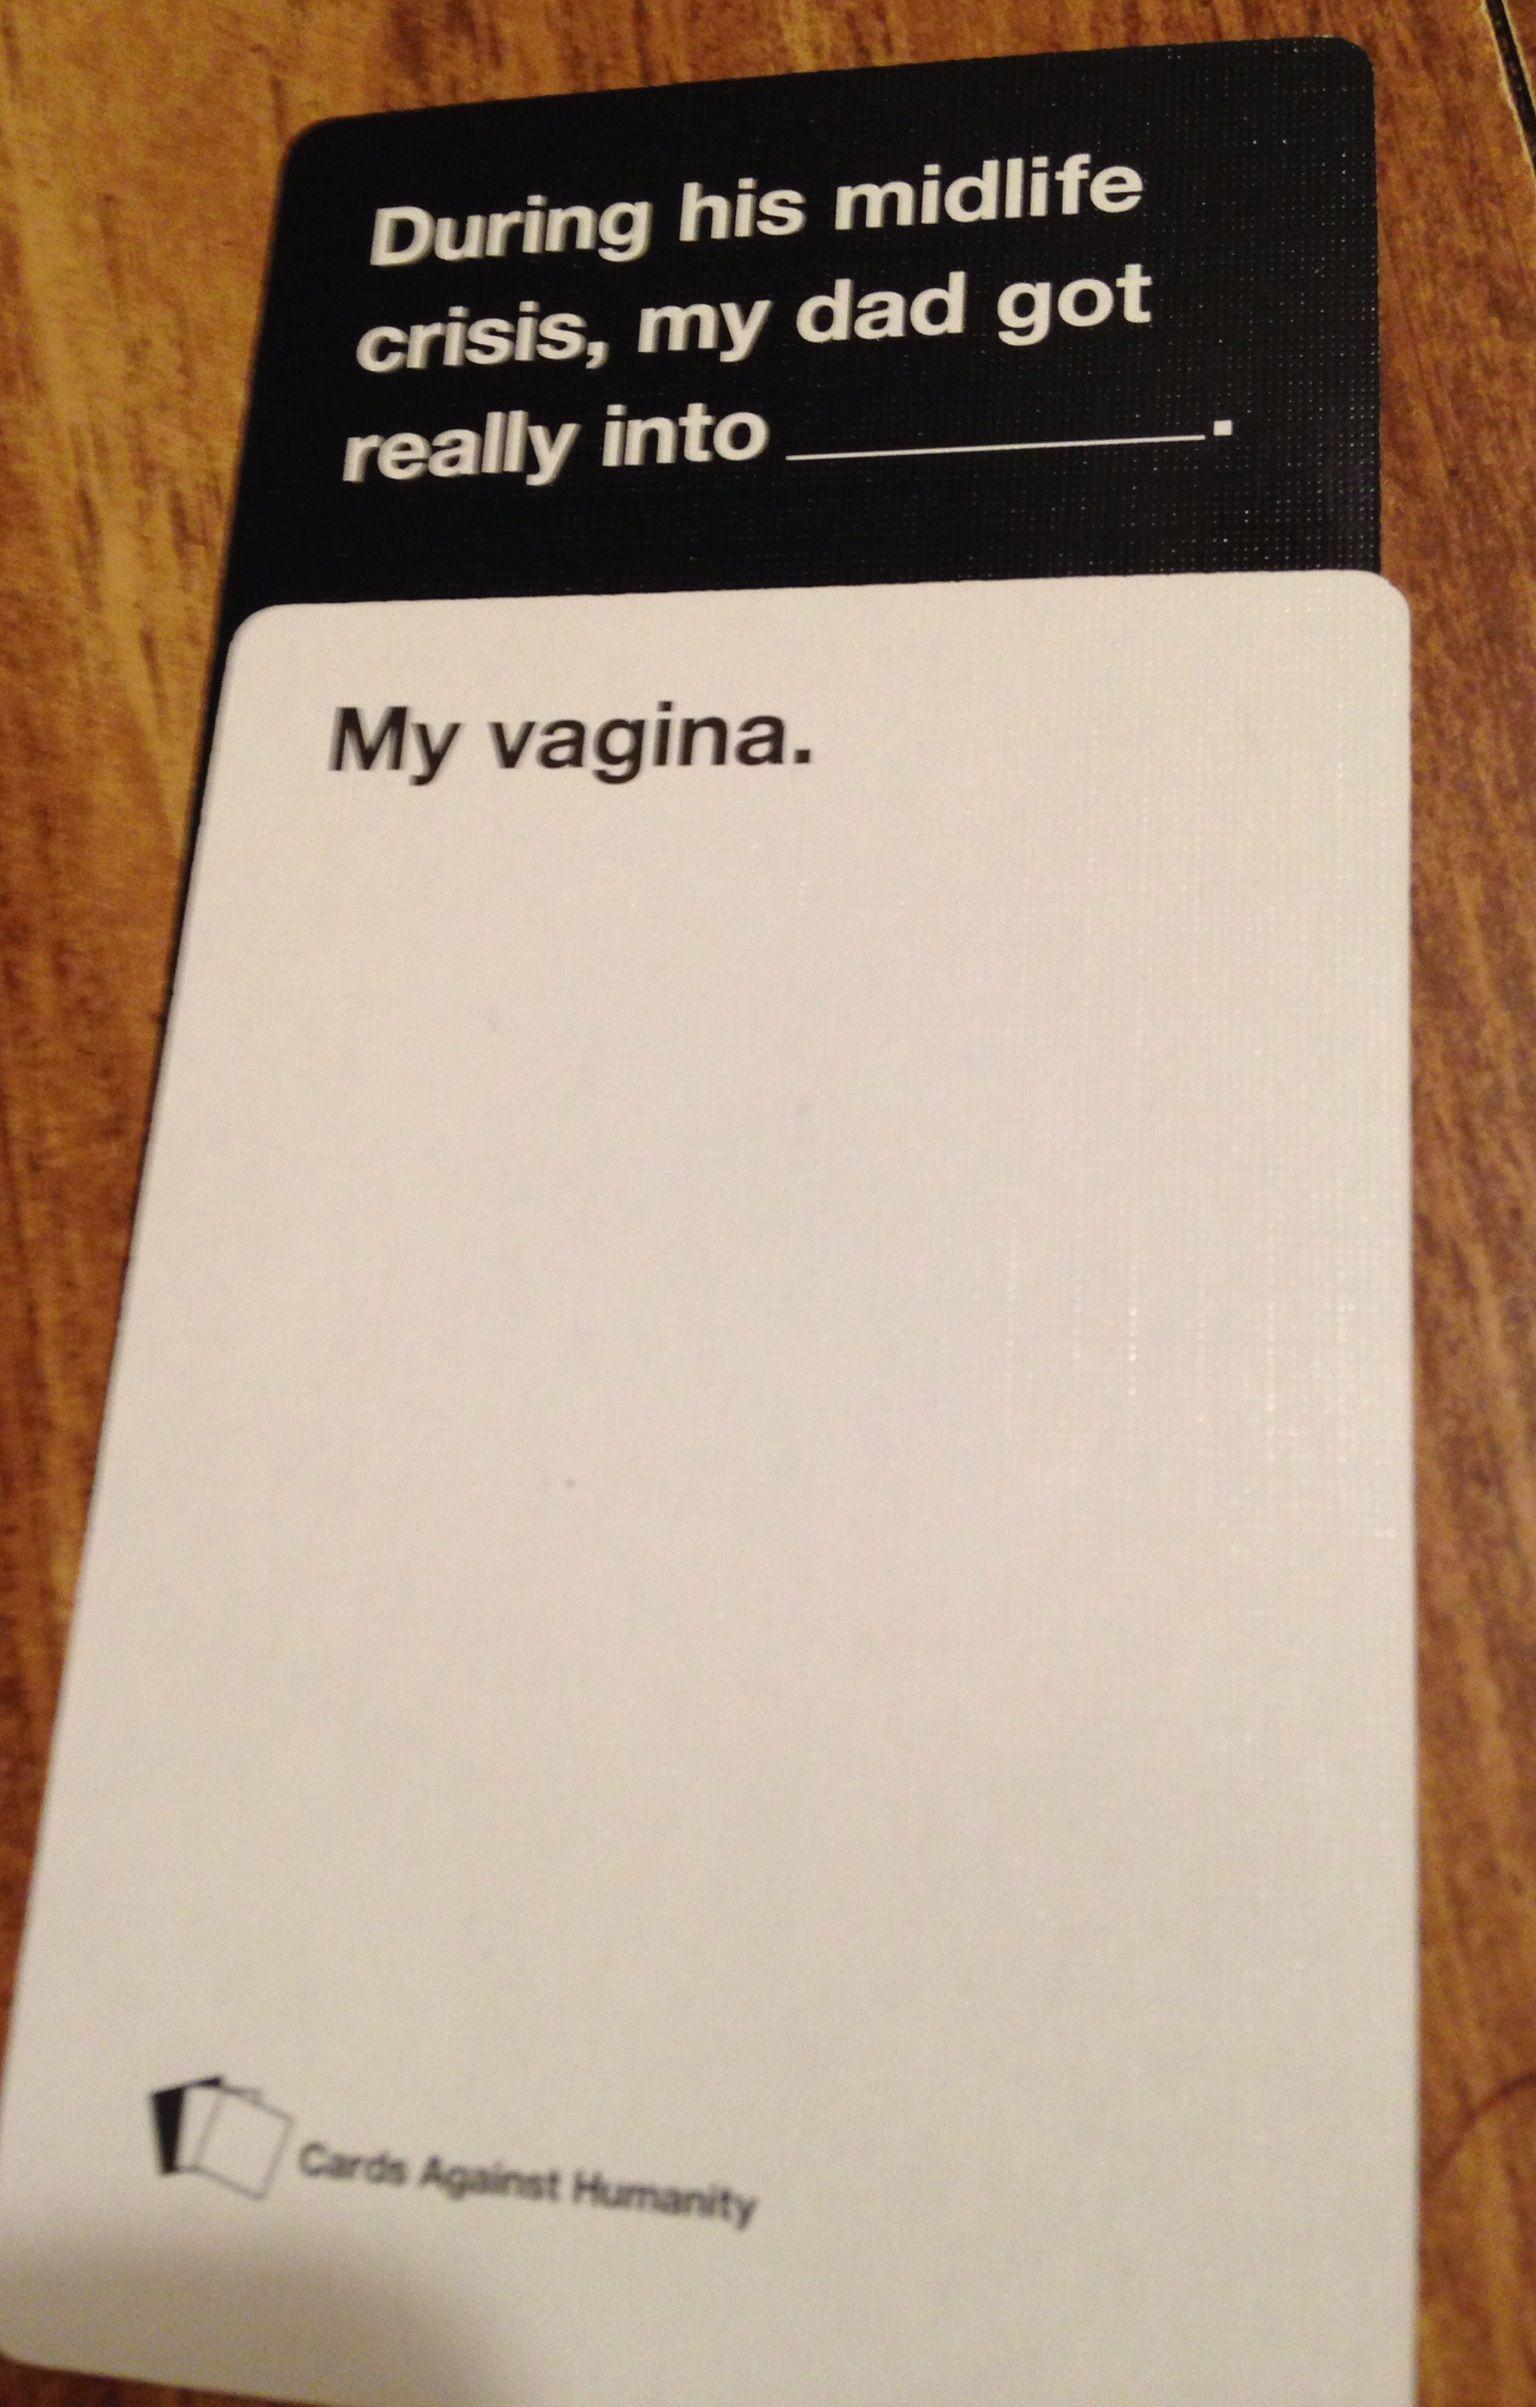 Cards against humanity cards against humanity funny